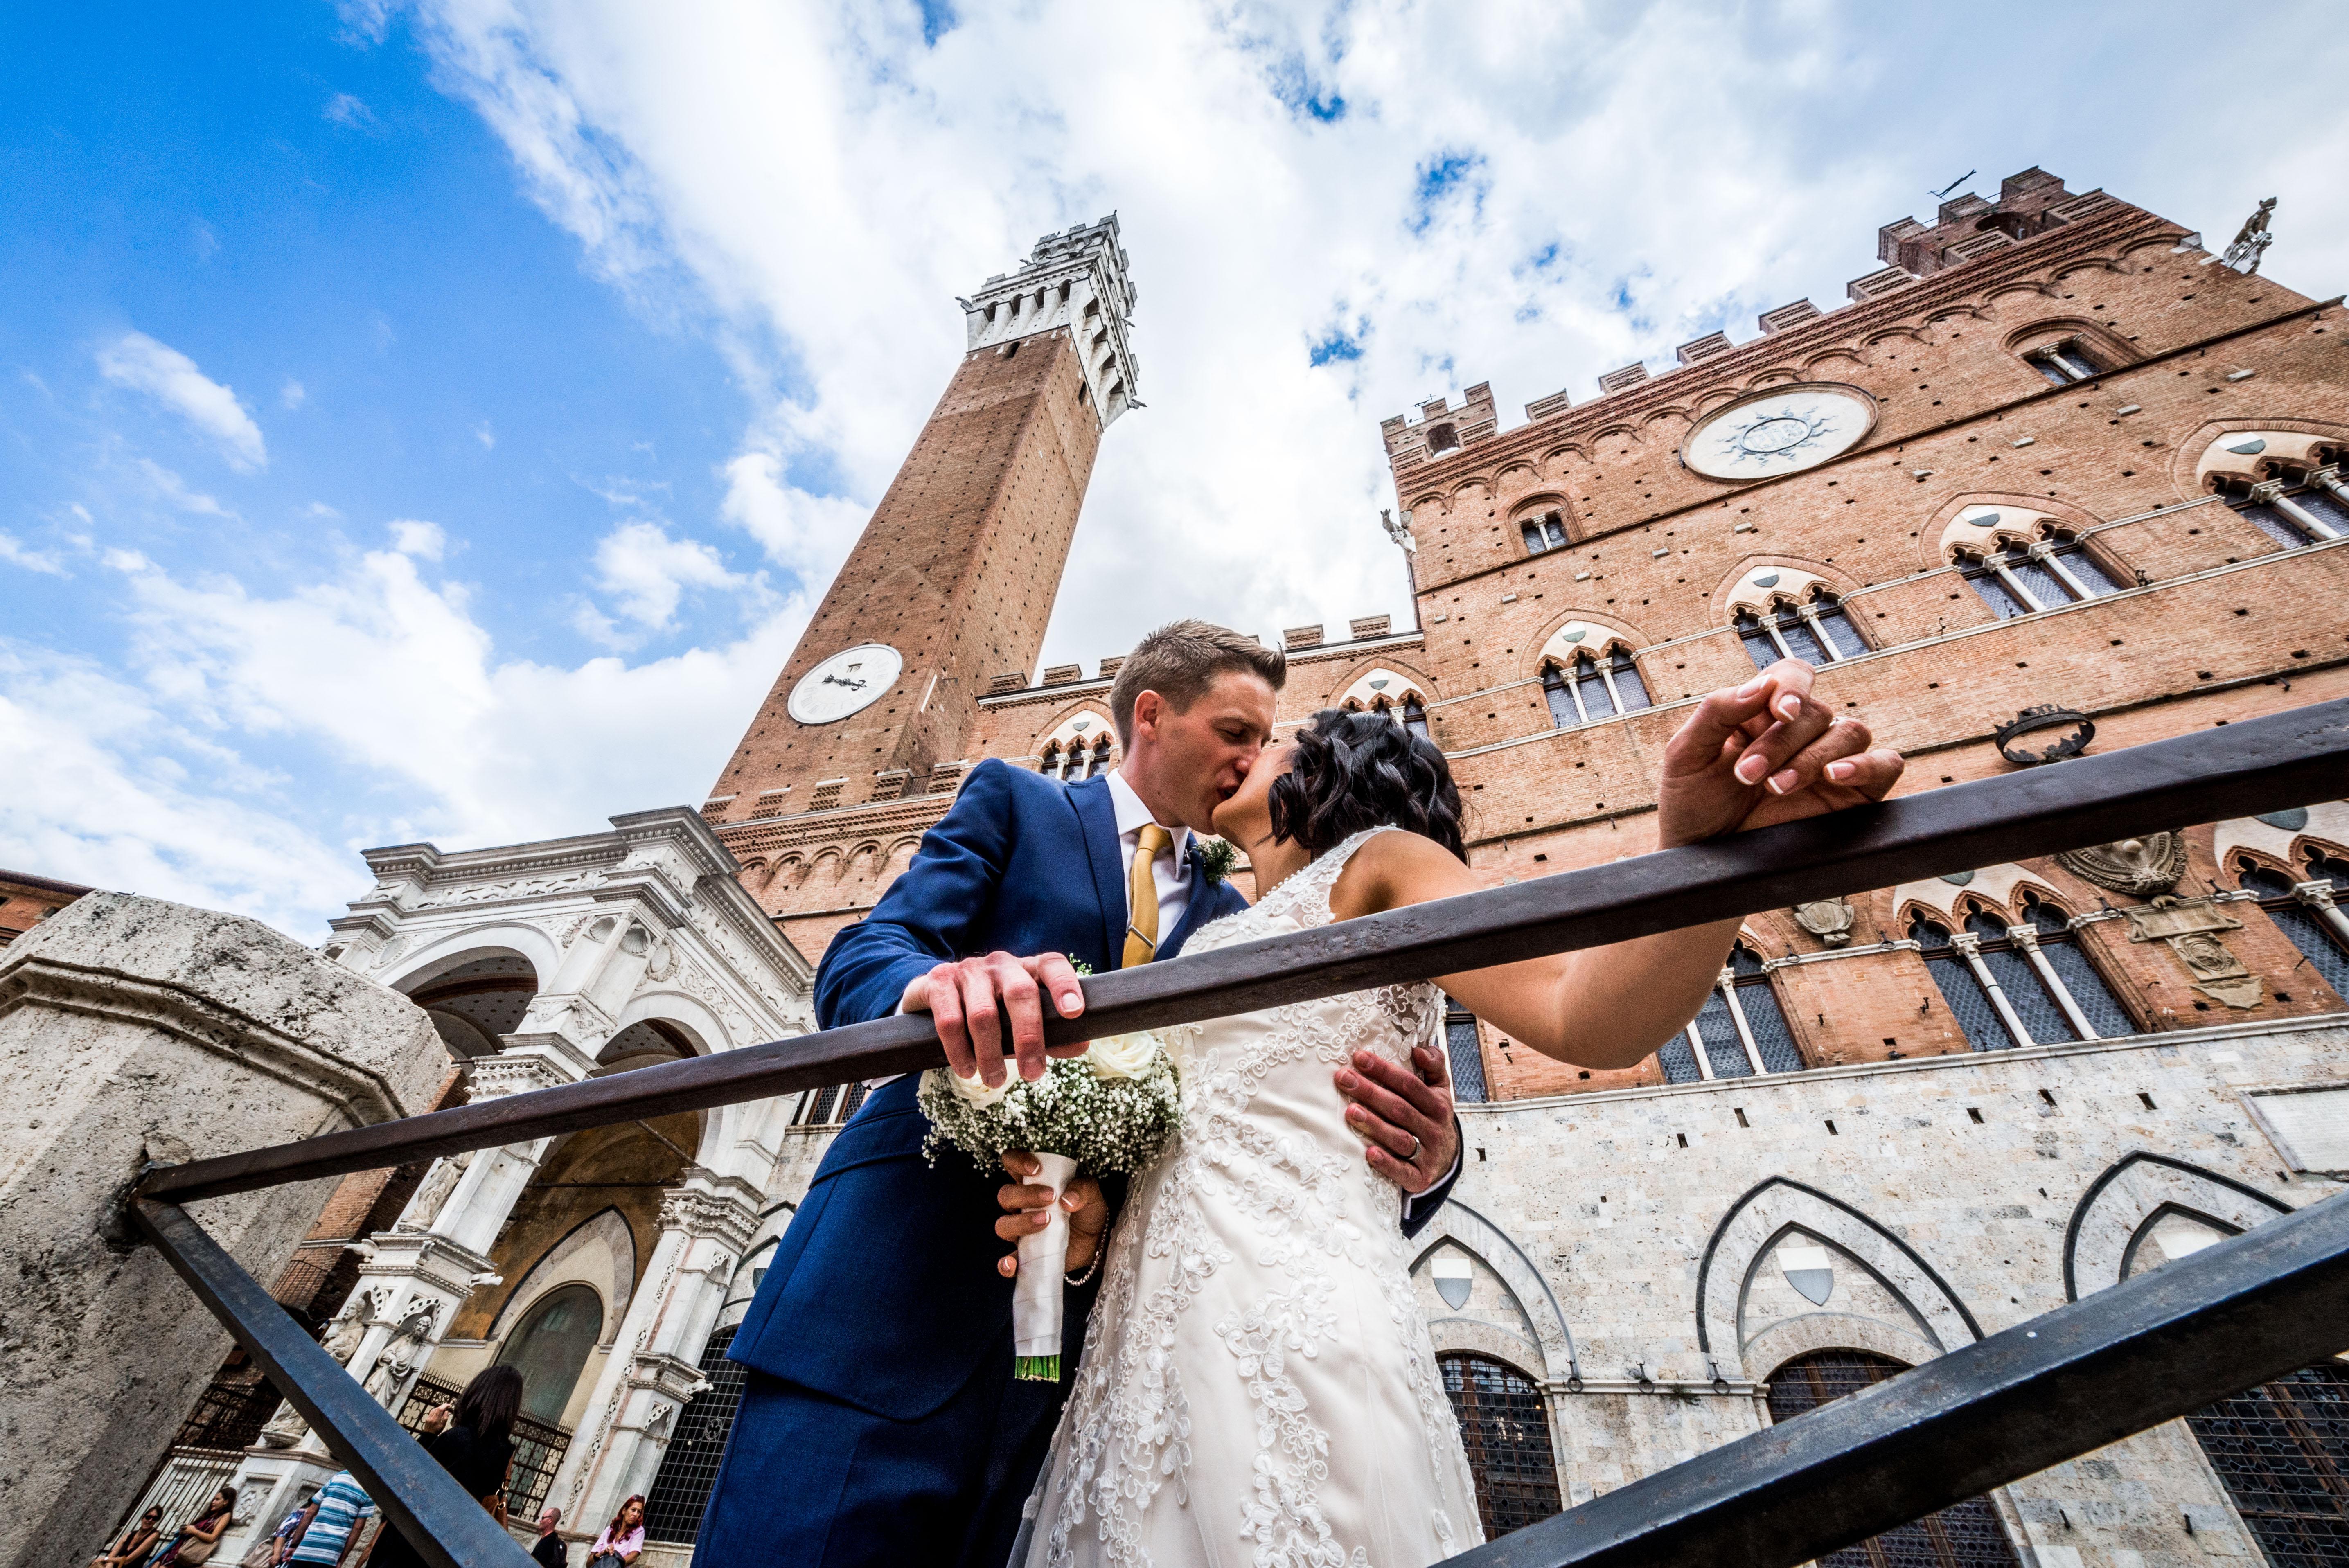 Argentieri Anthony Wedding Photographer_-259